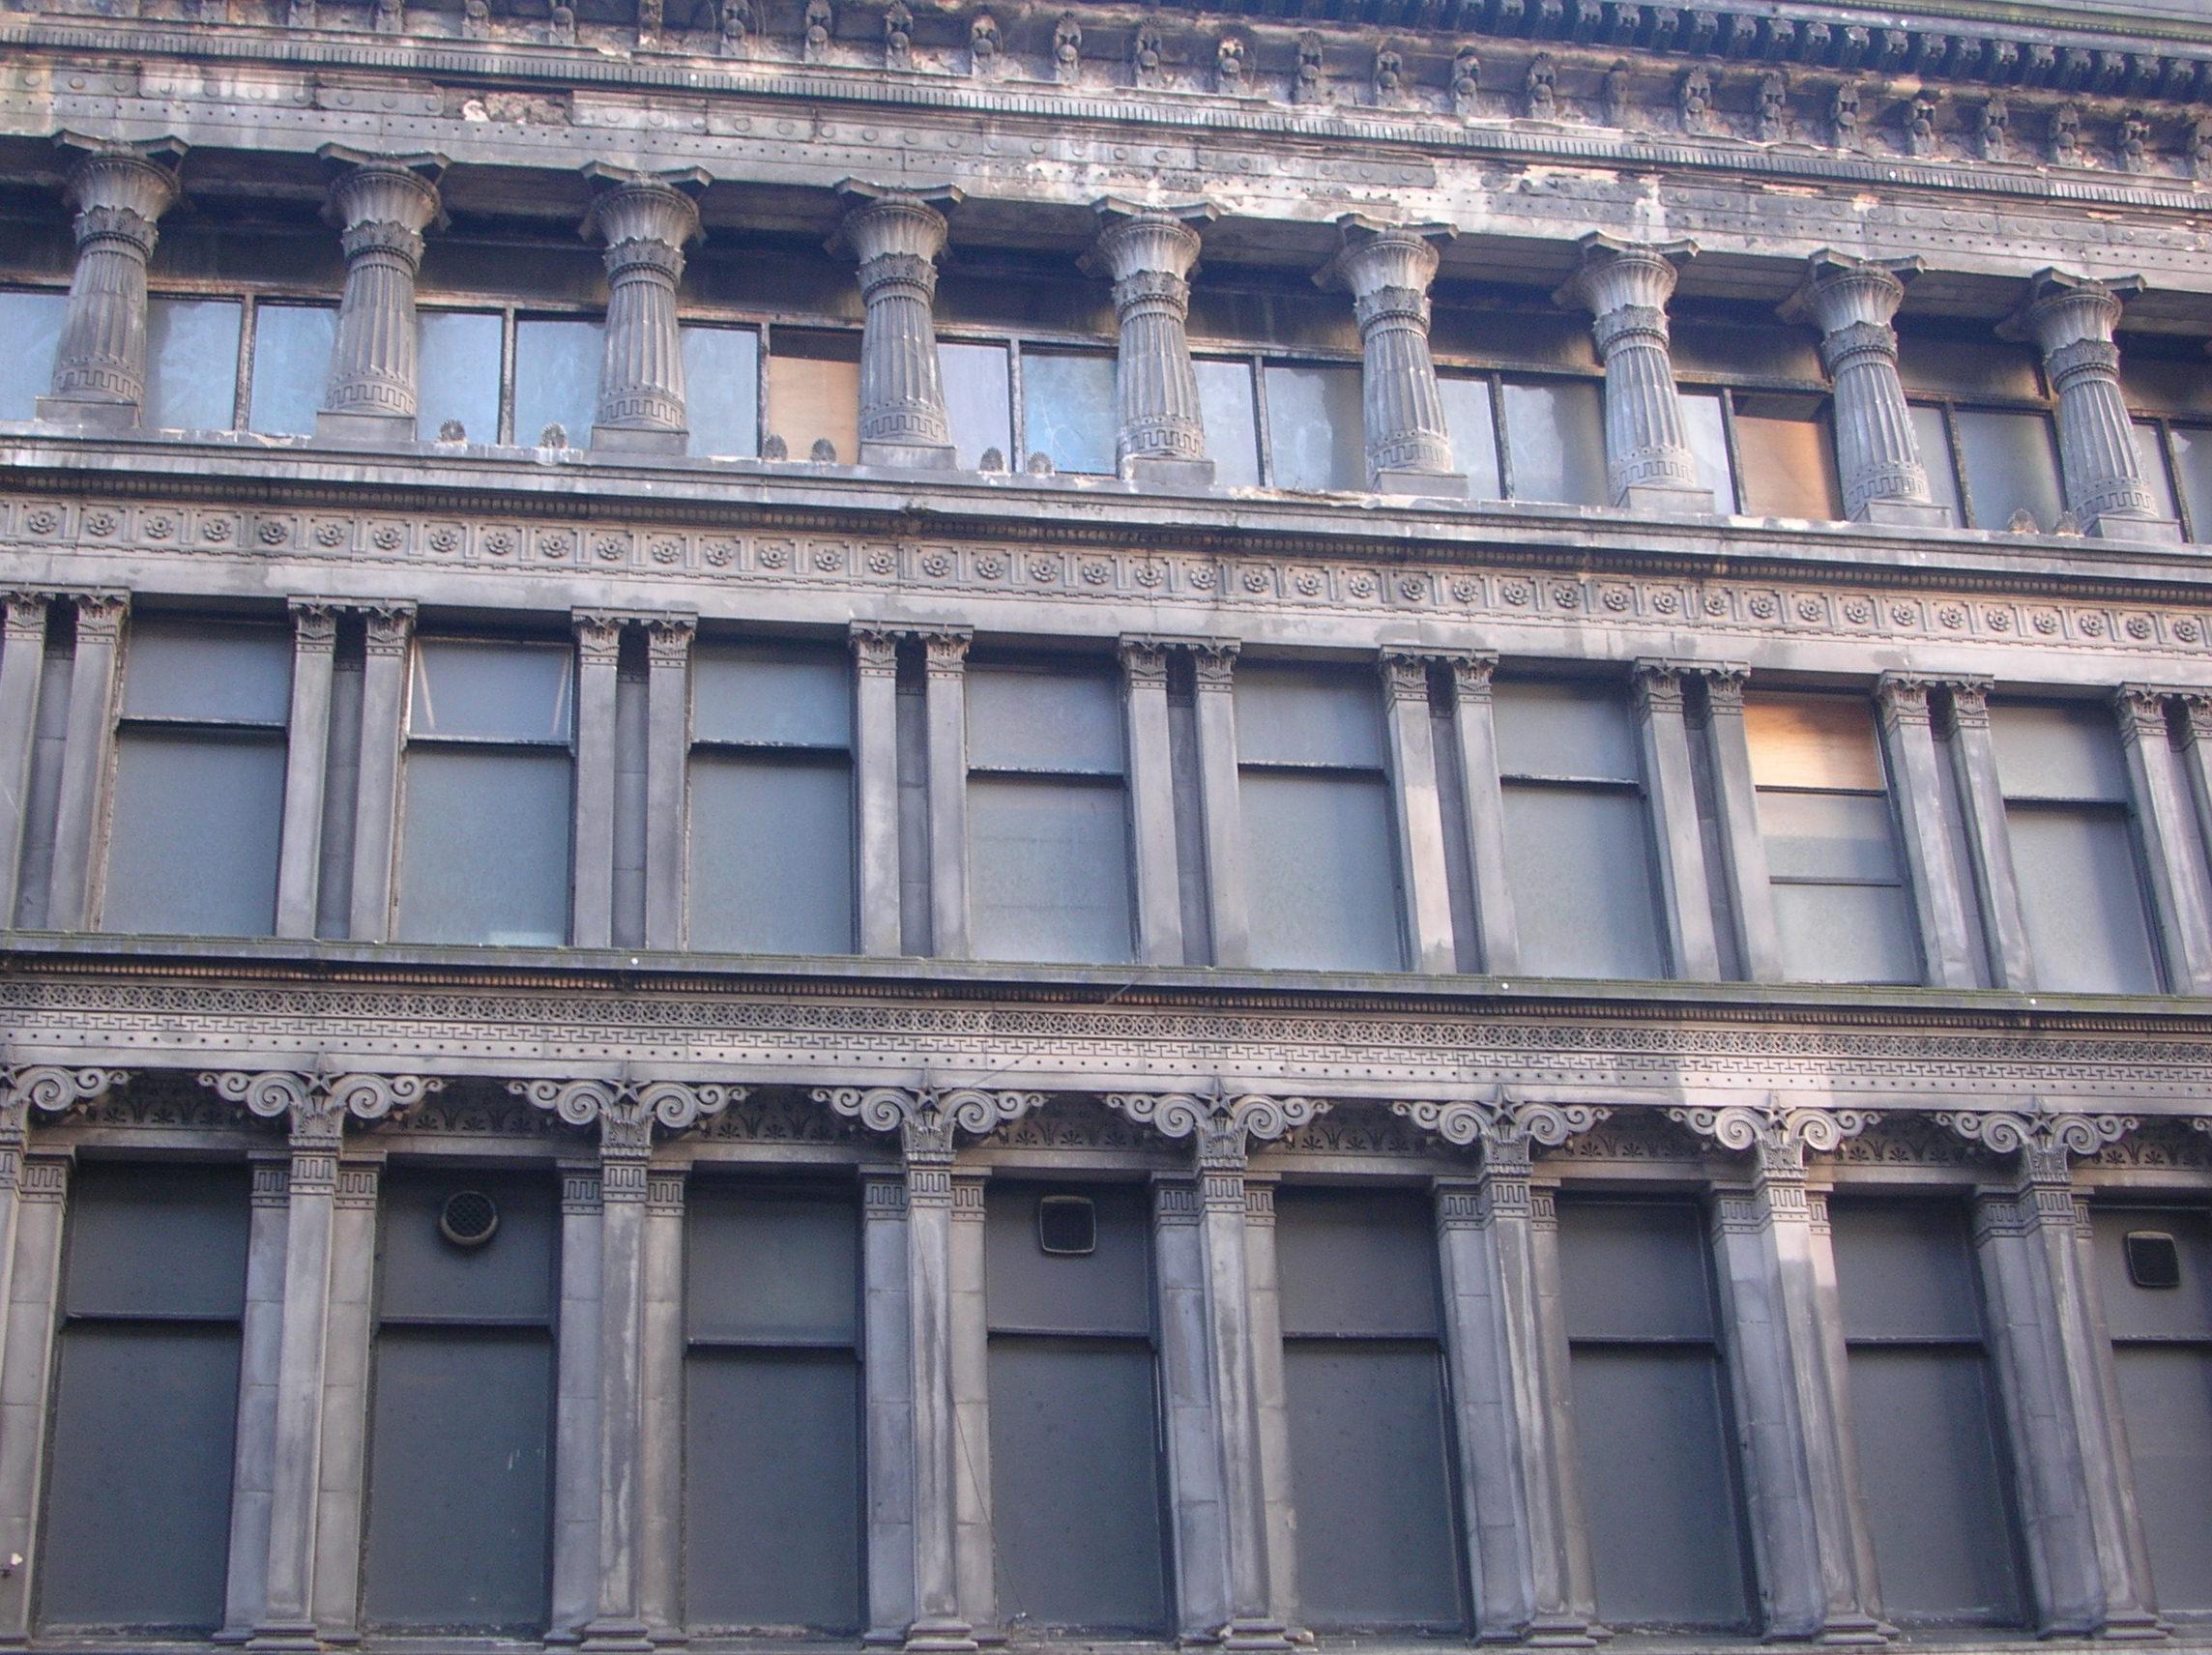 Egyptian Halls (Wikipedia)